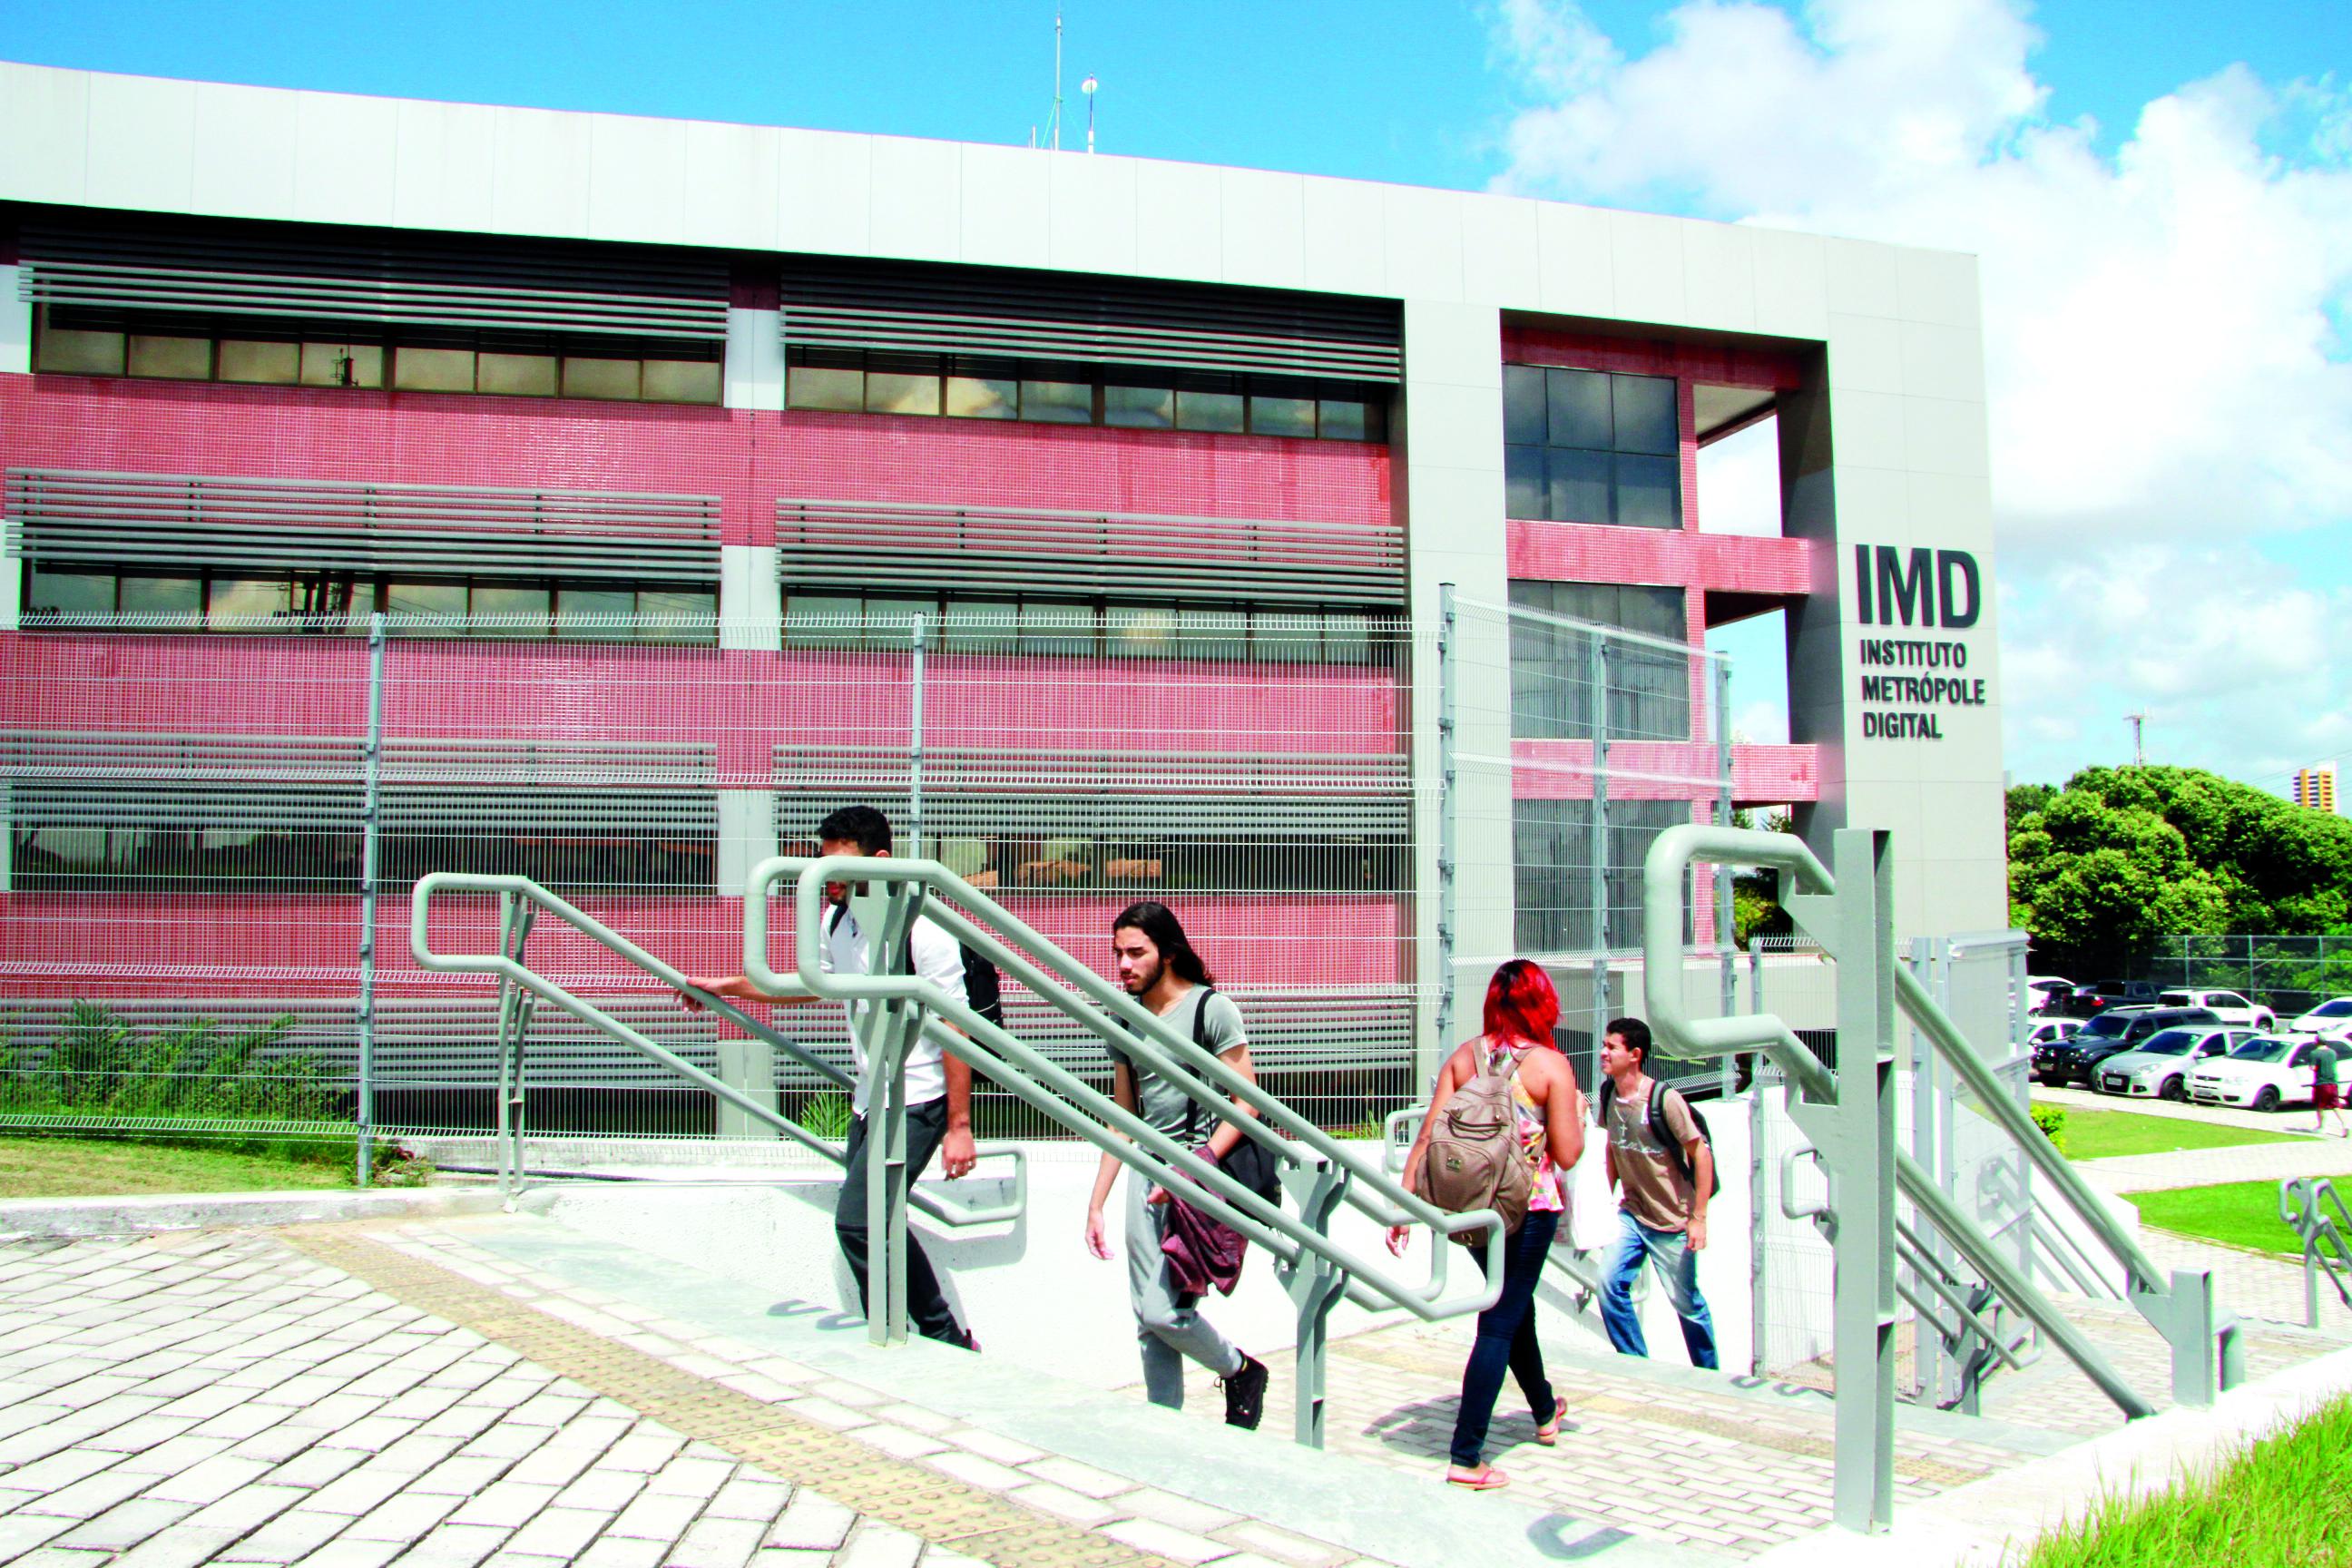 Instituto Metrópole Digital IMD UFRN 8